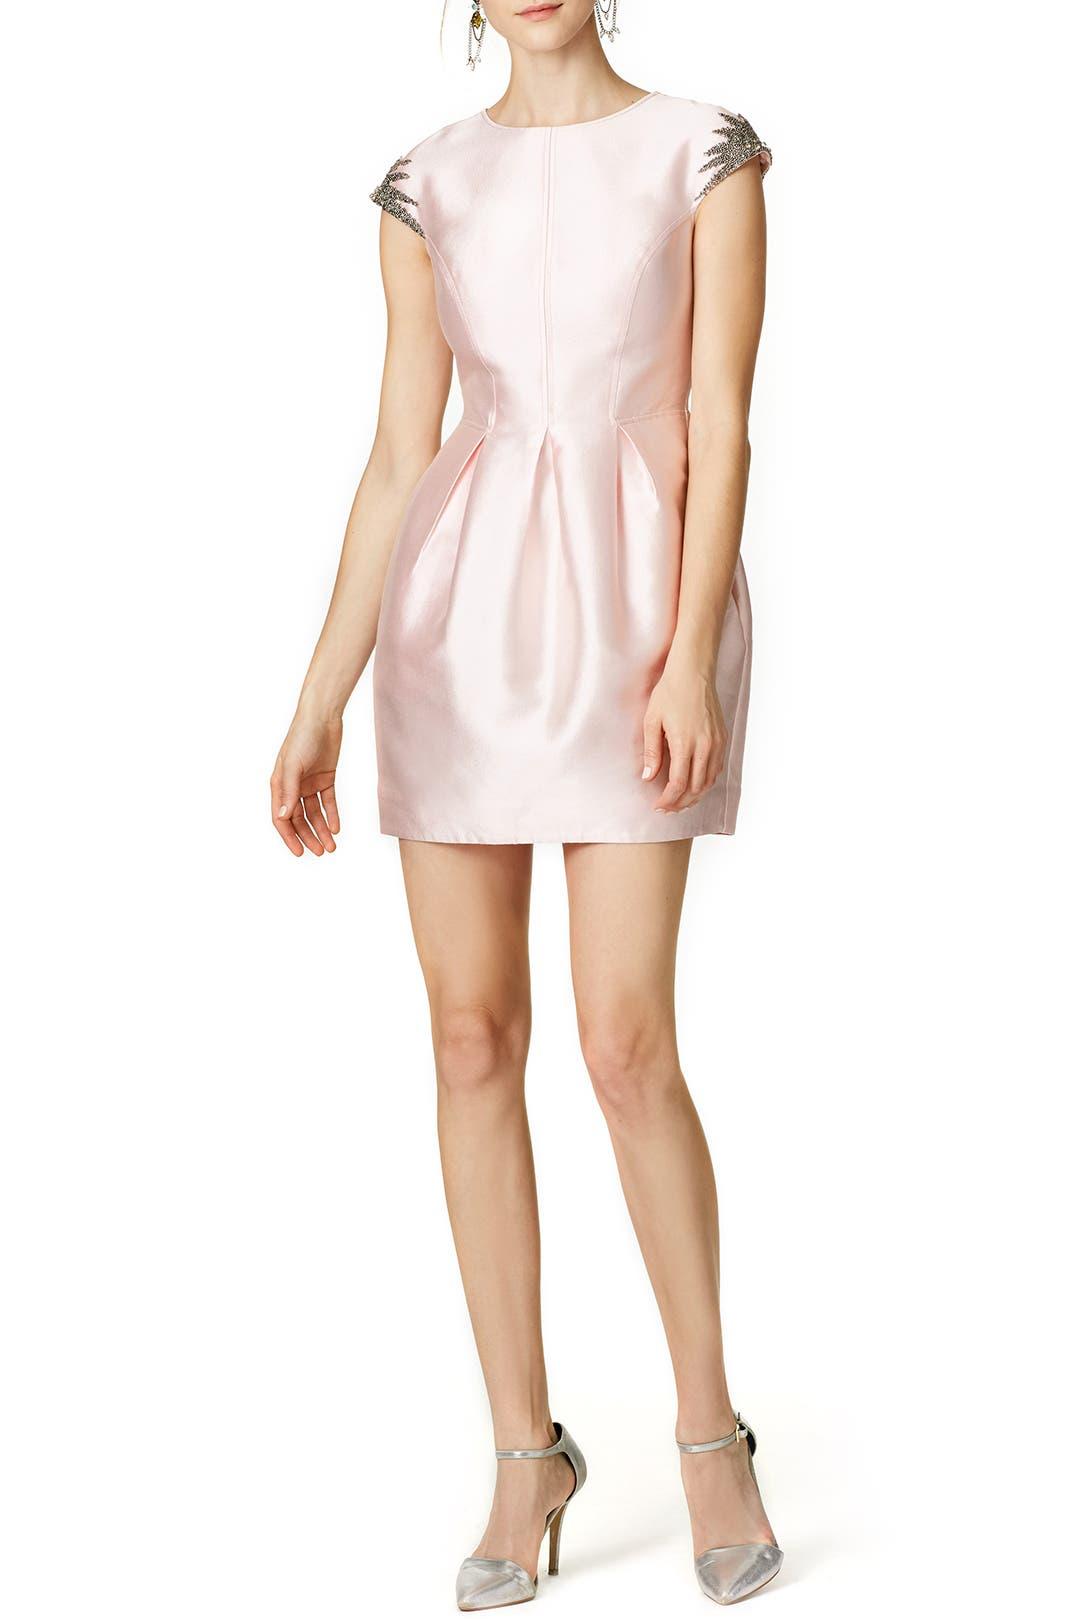 Cynthia Rowley Shimmering Tulip Dress